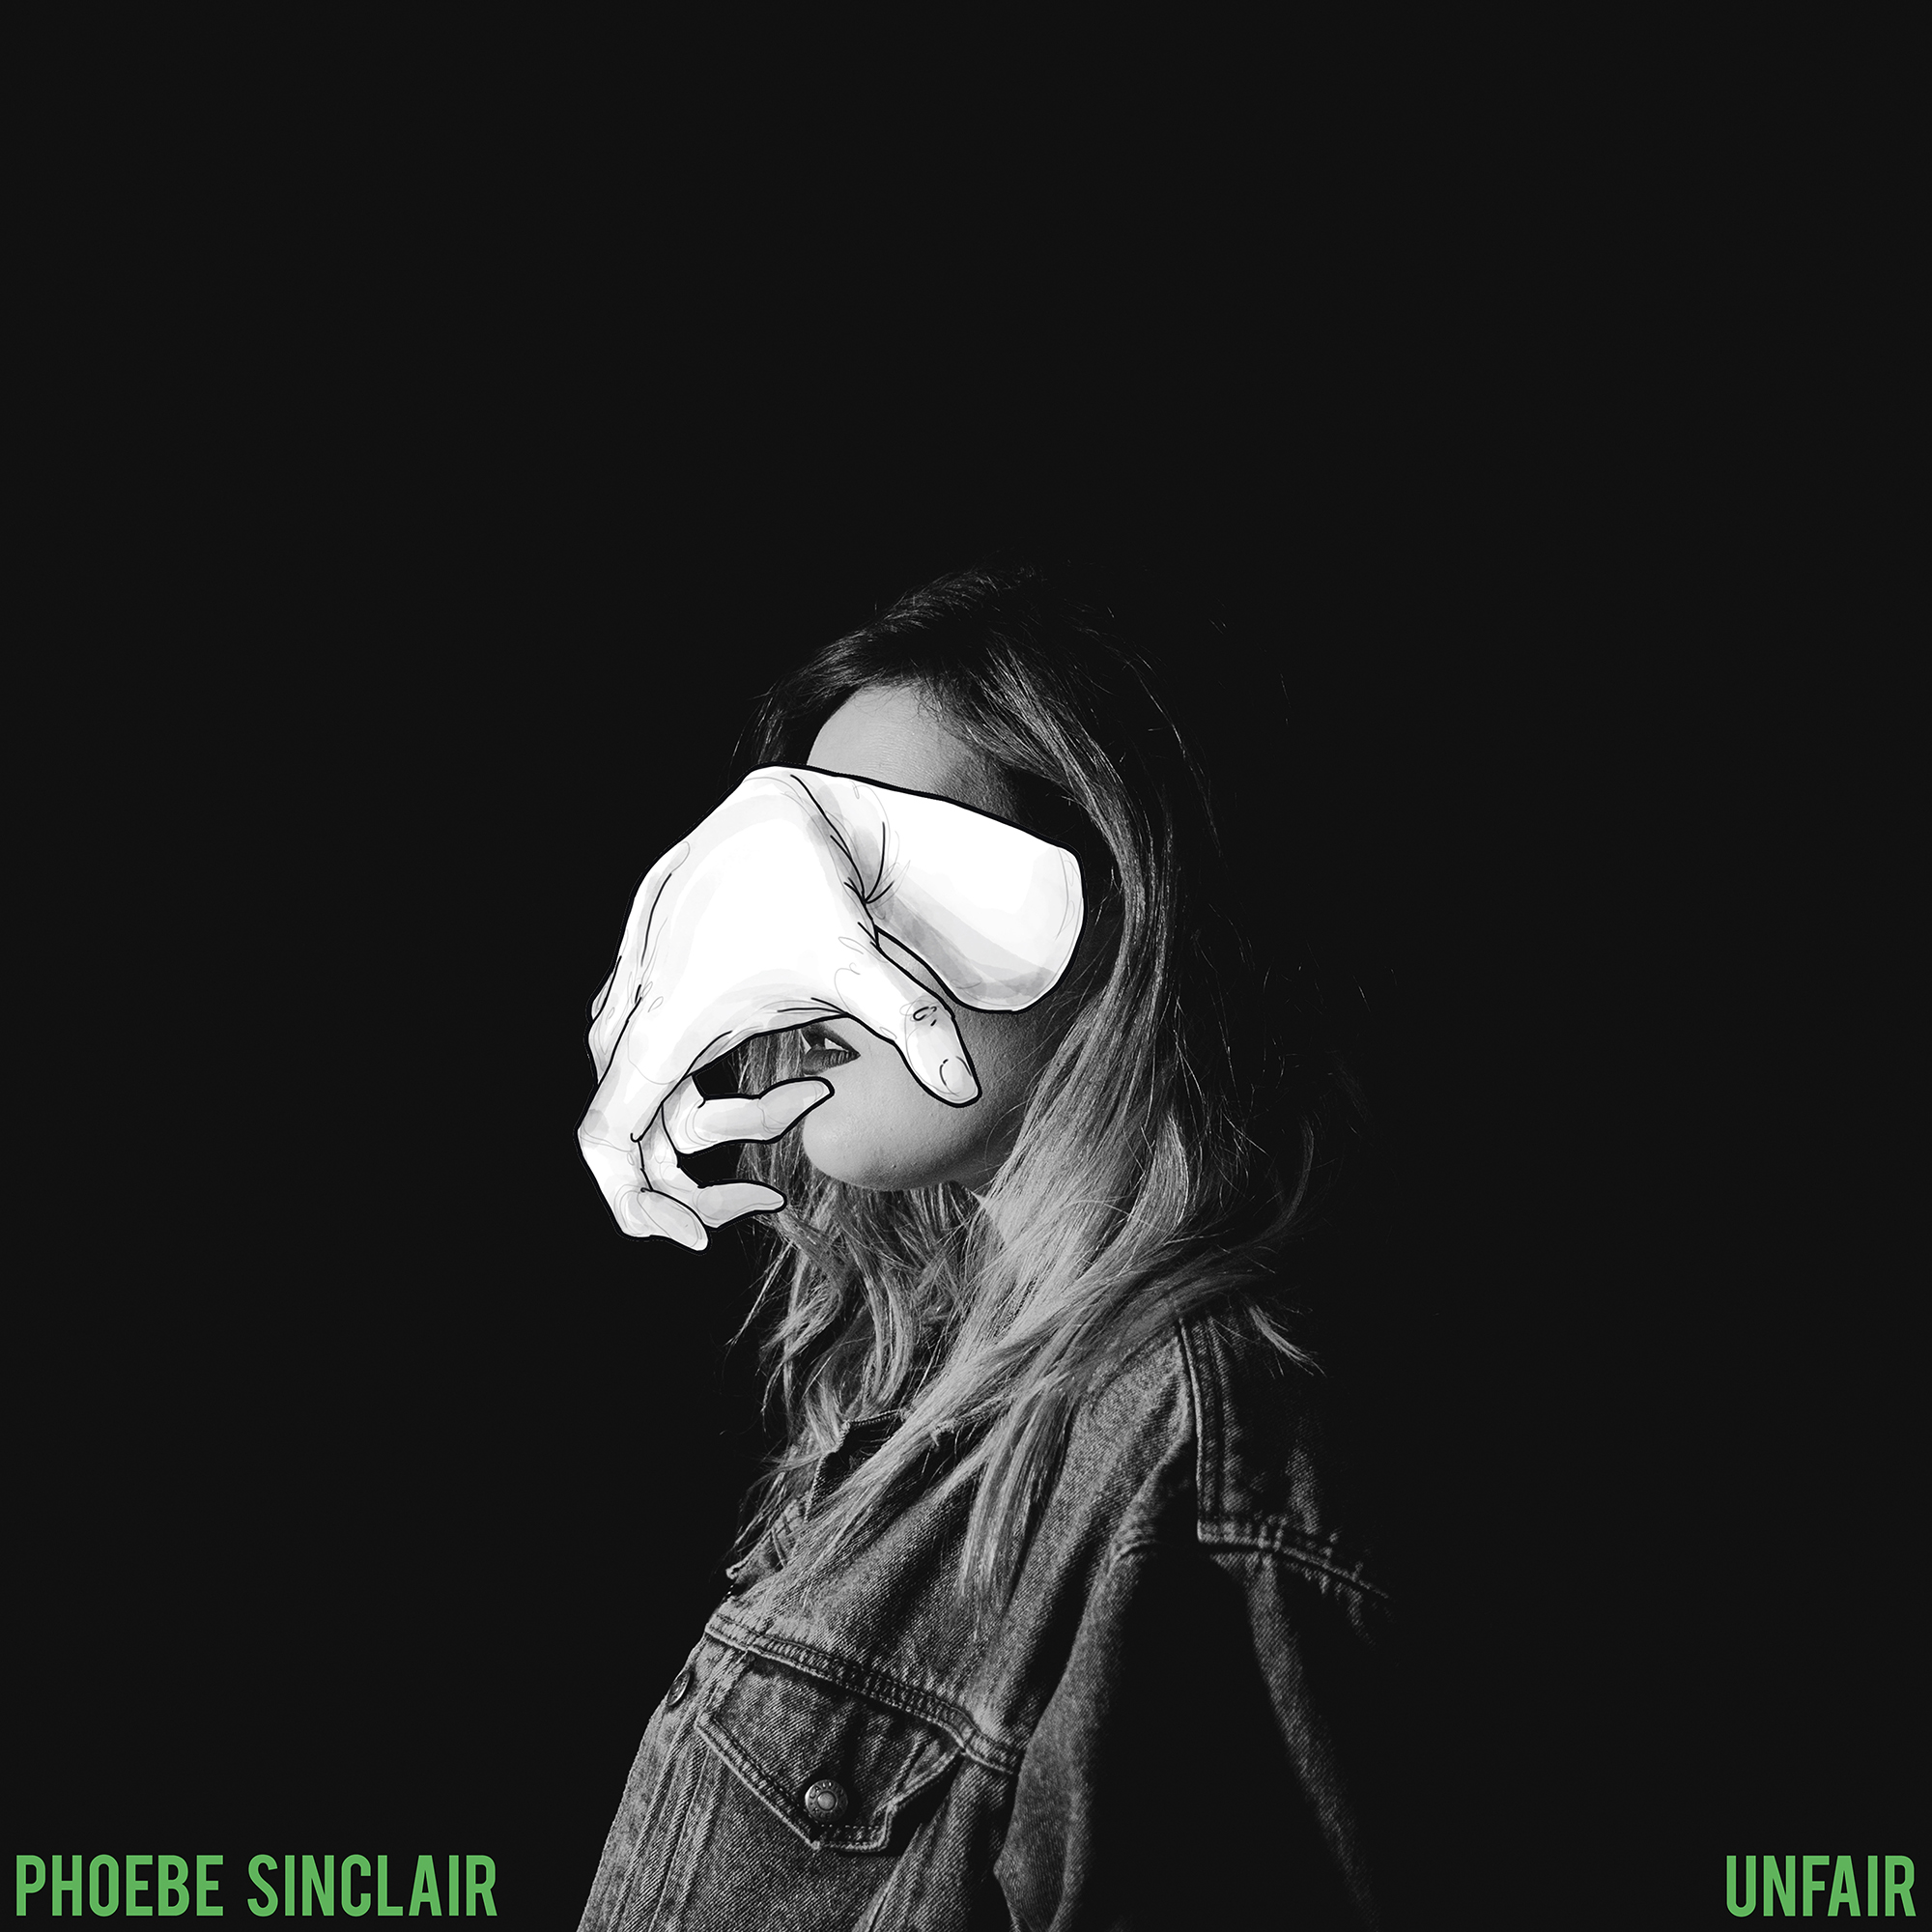 Phoebe Sinclair - Unfair.jpg